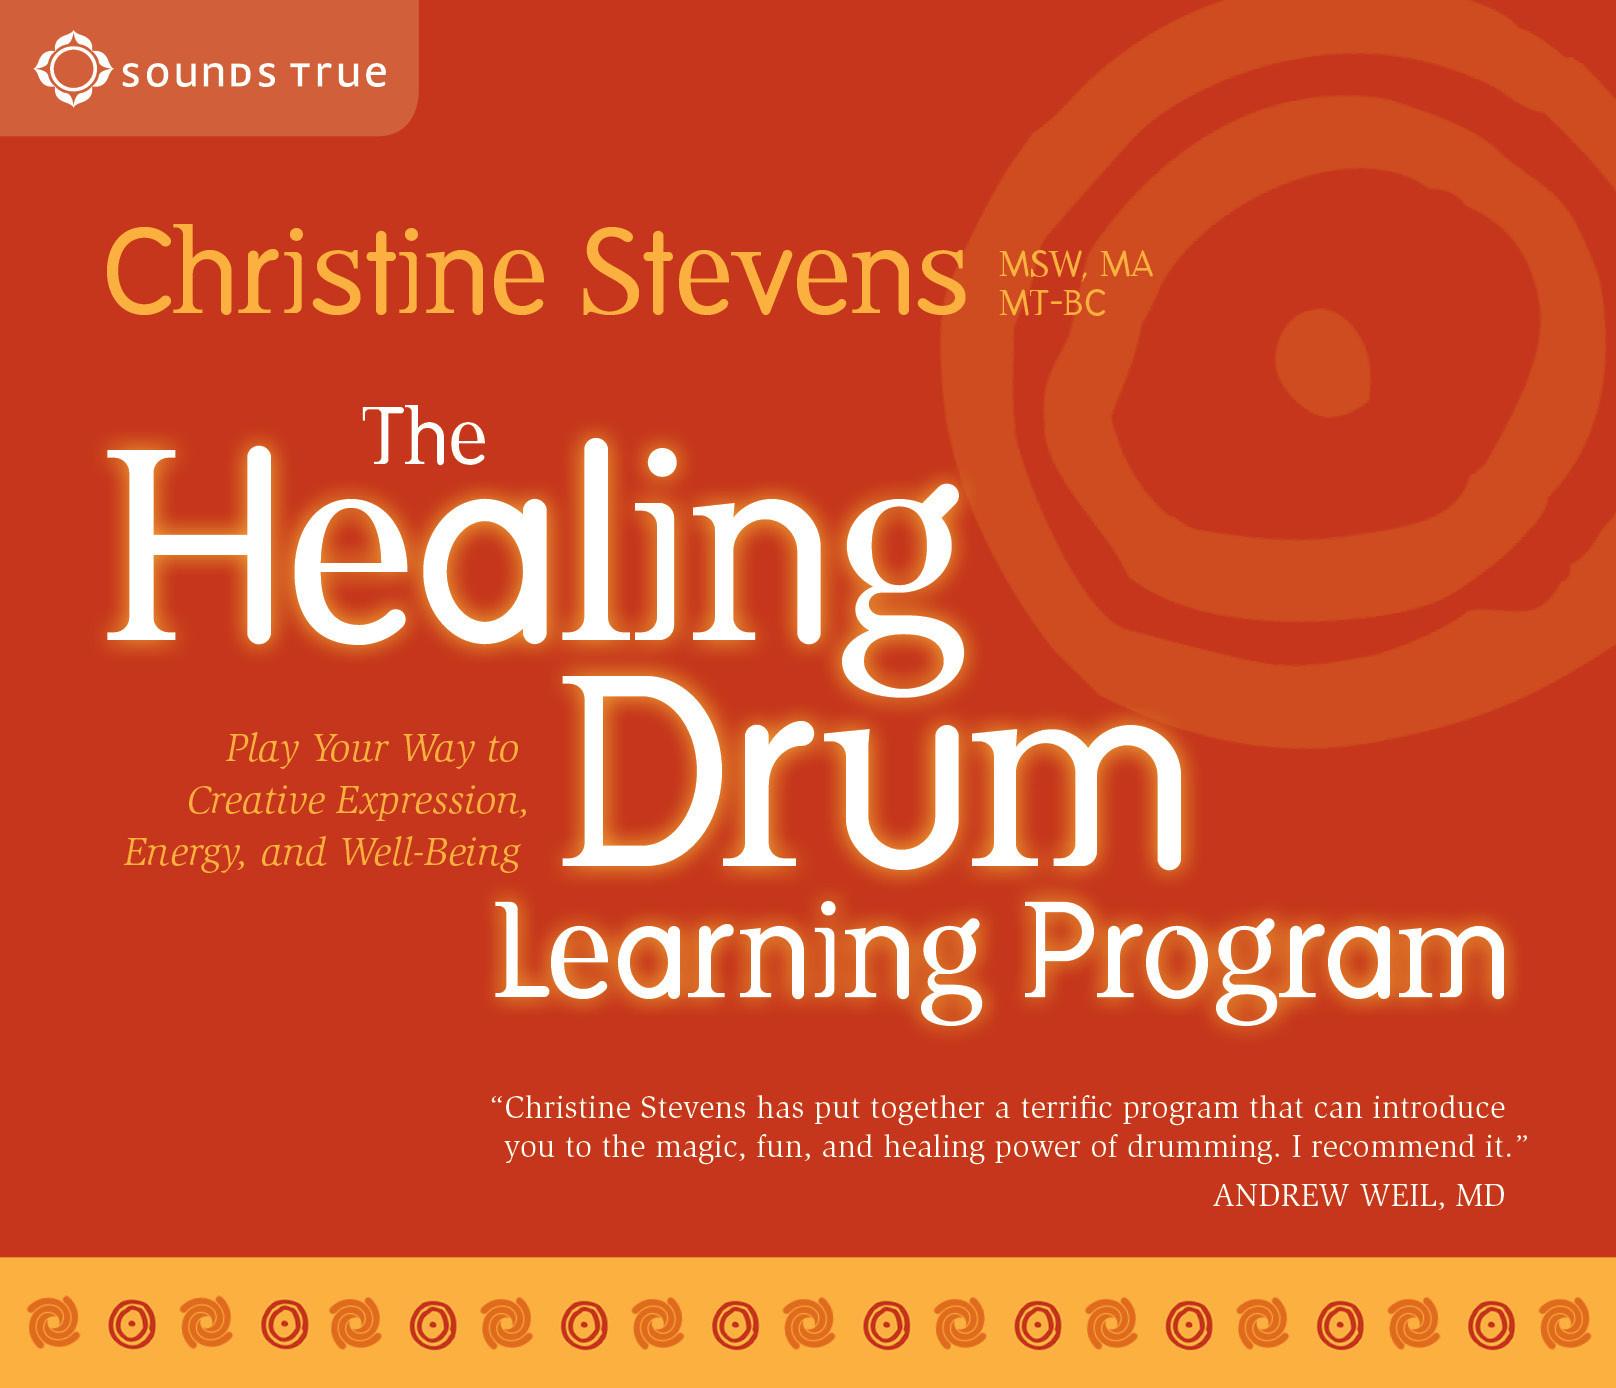 Healing Drum Kit Workshop $35